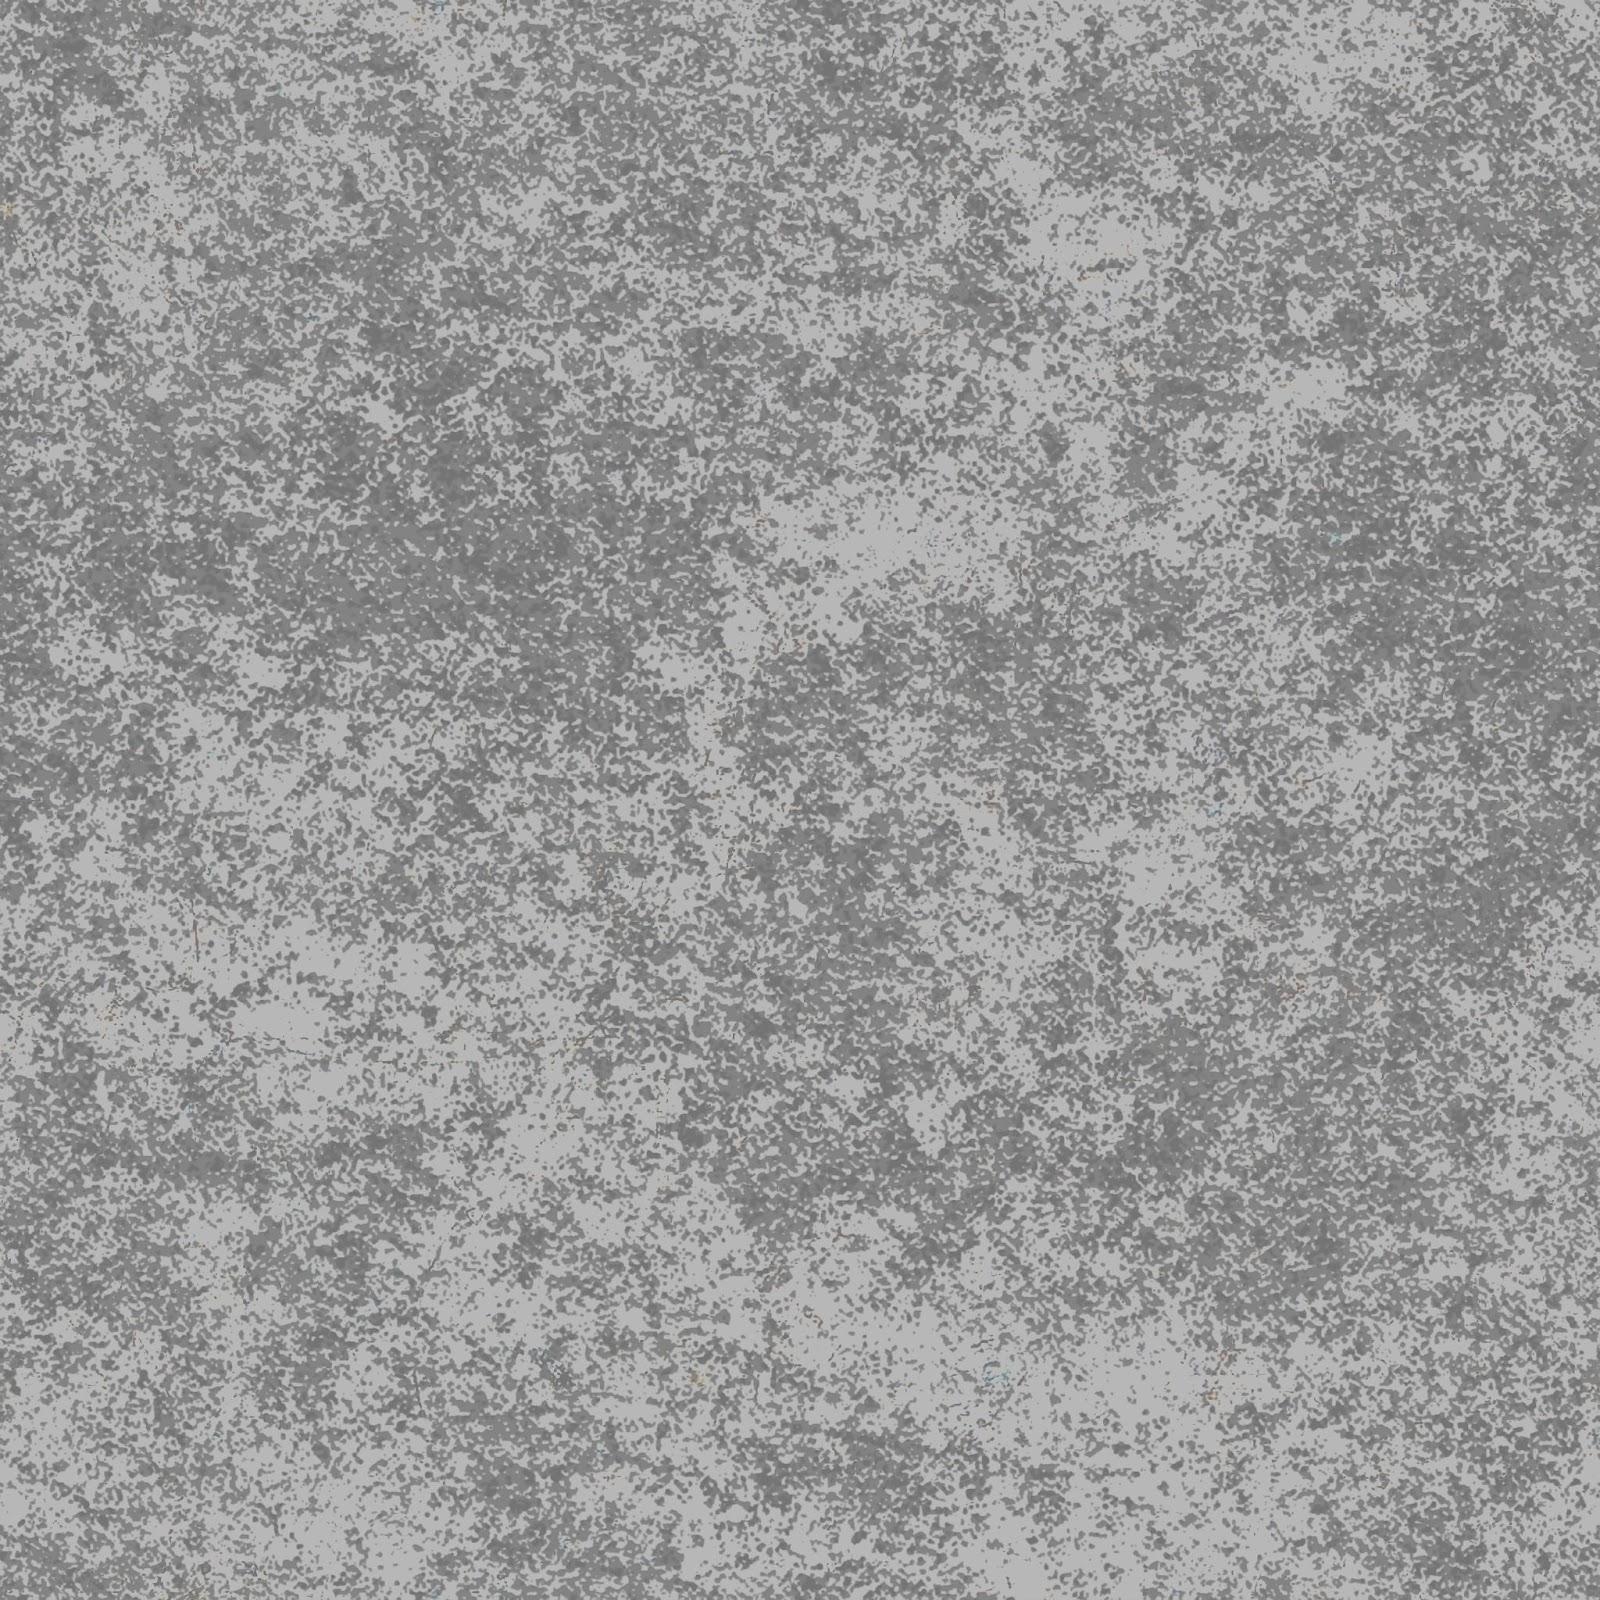 New Metal Seamless TextureRed Metal Texture Seamless